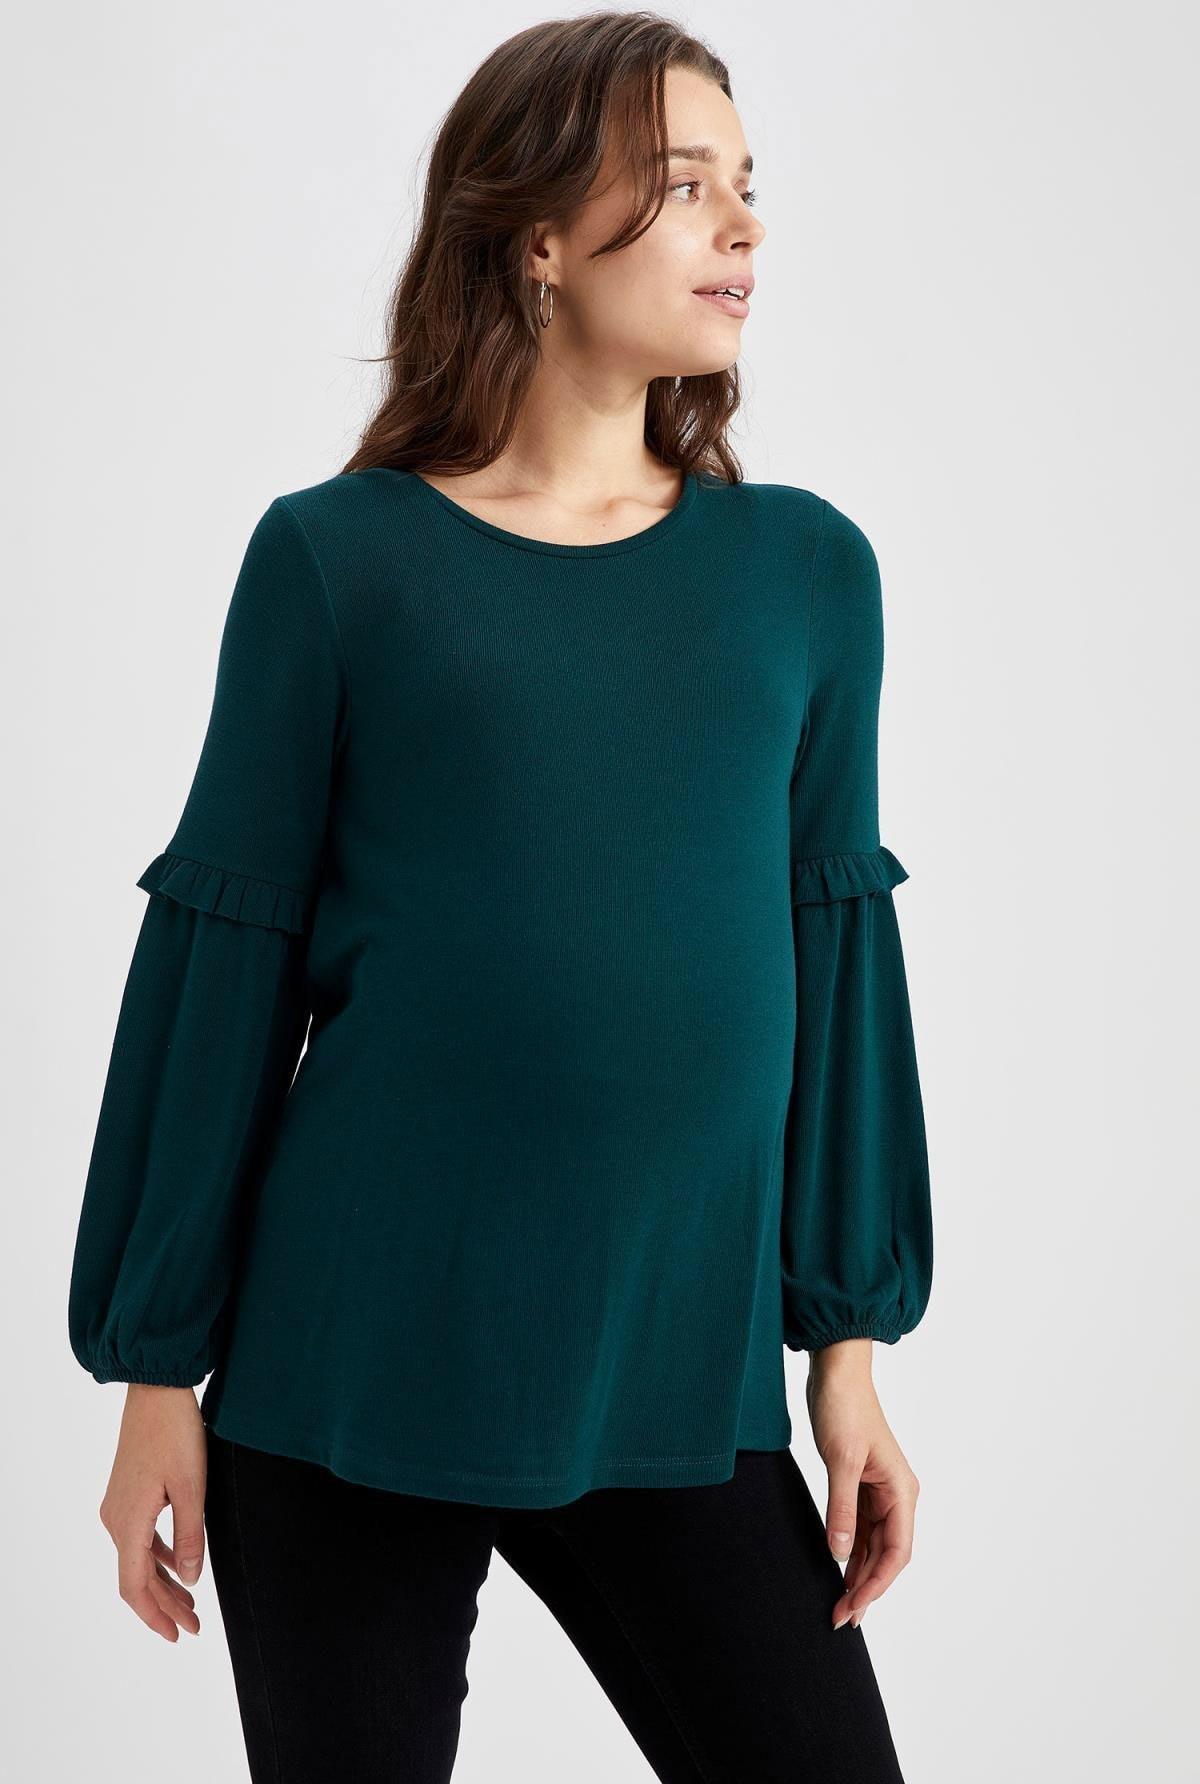 image تیشرت بارداری زنانه Relax سبز برند Defacto کد 1608711841